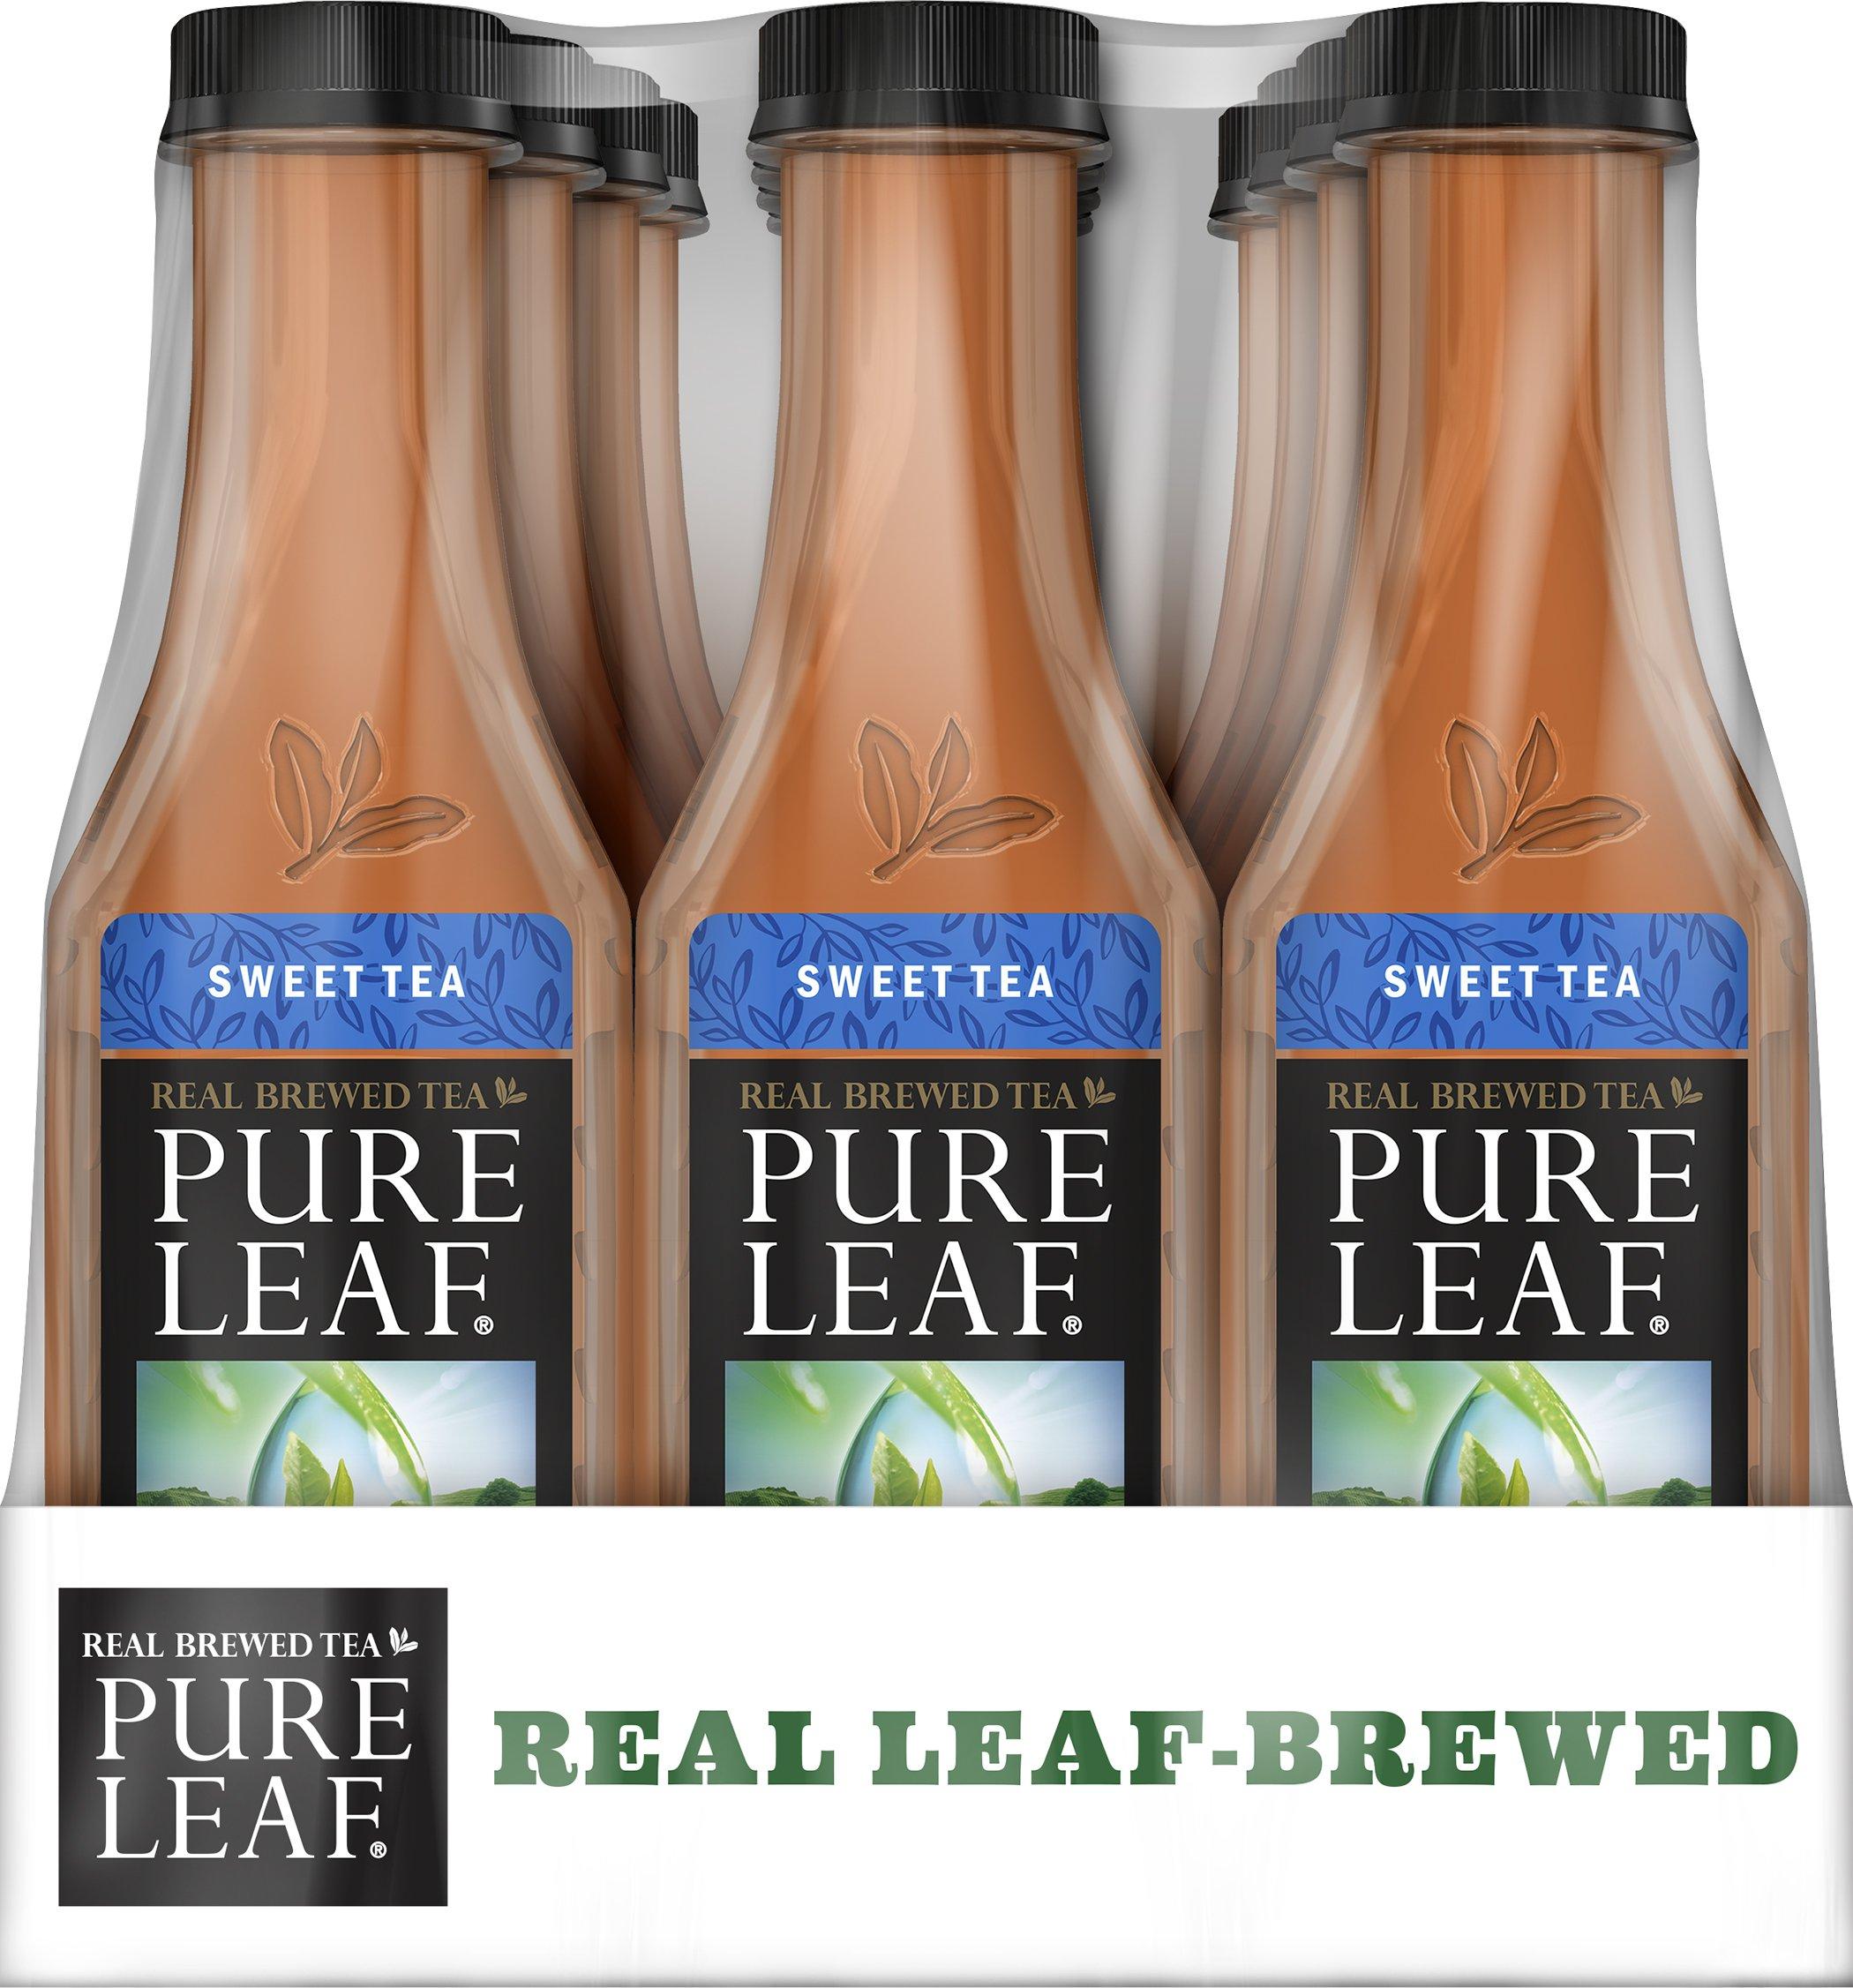 Amazon.com : Pure Leaf Sweet Tea, 18.5 Oz (Pack of 12) : Bottled Iced Tea Drinks : Grocery